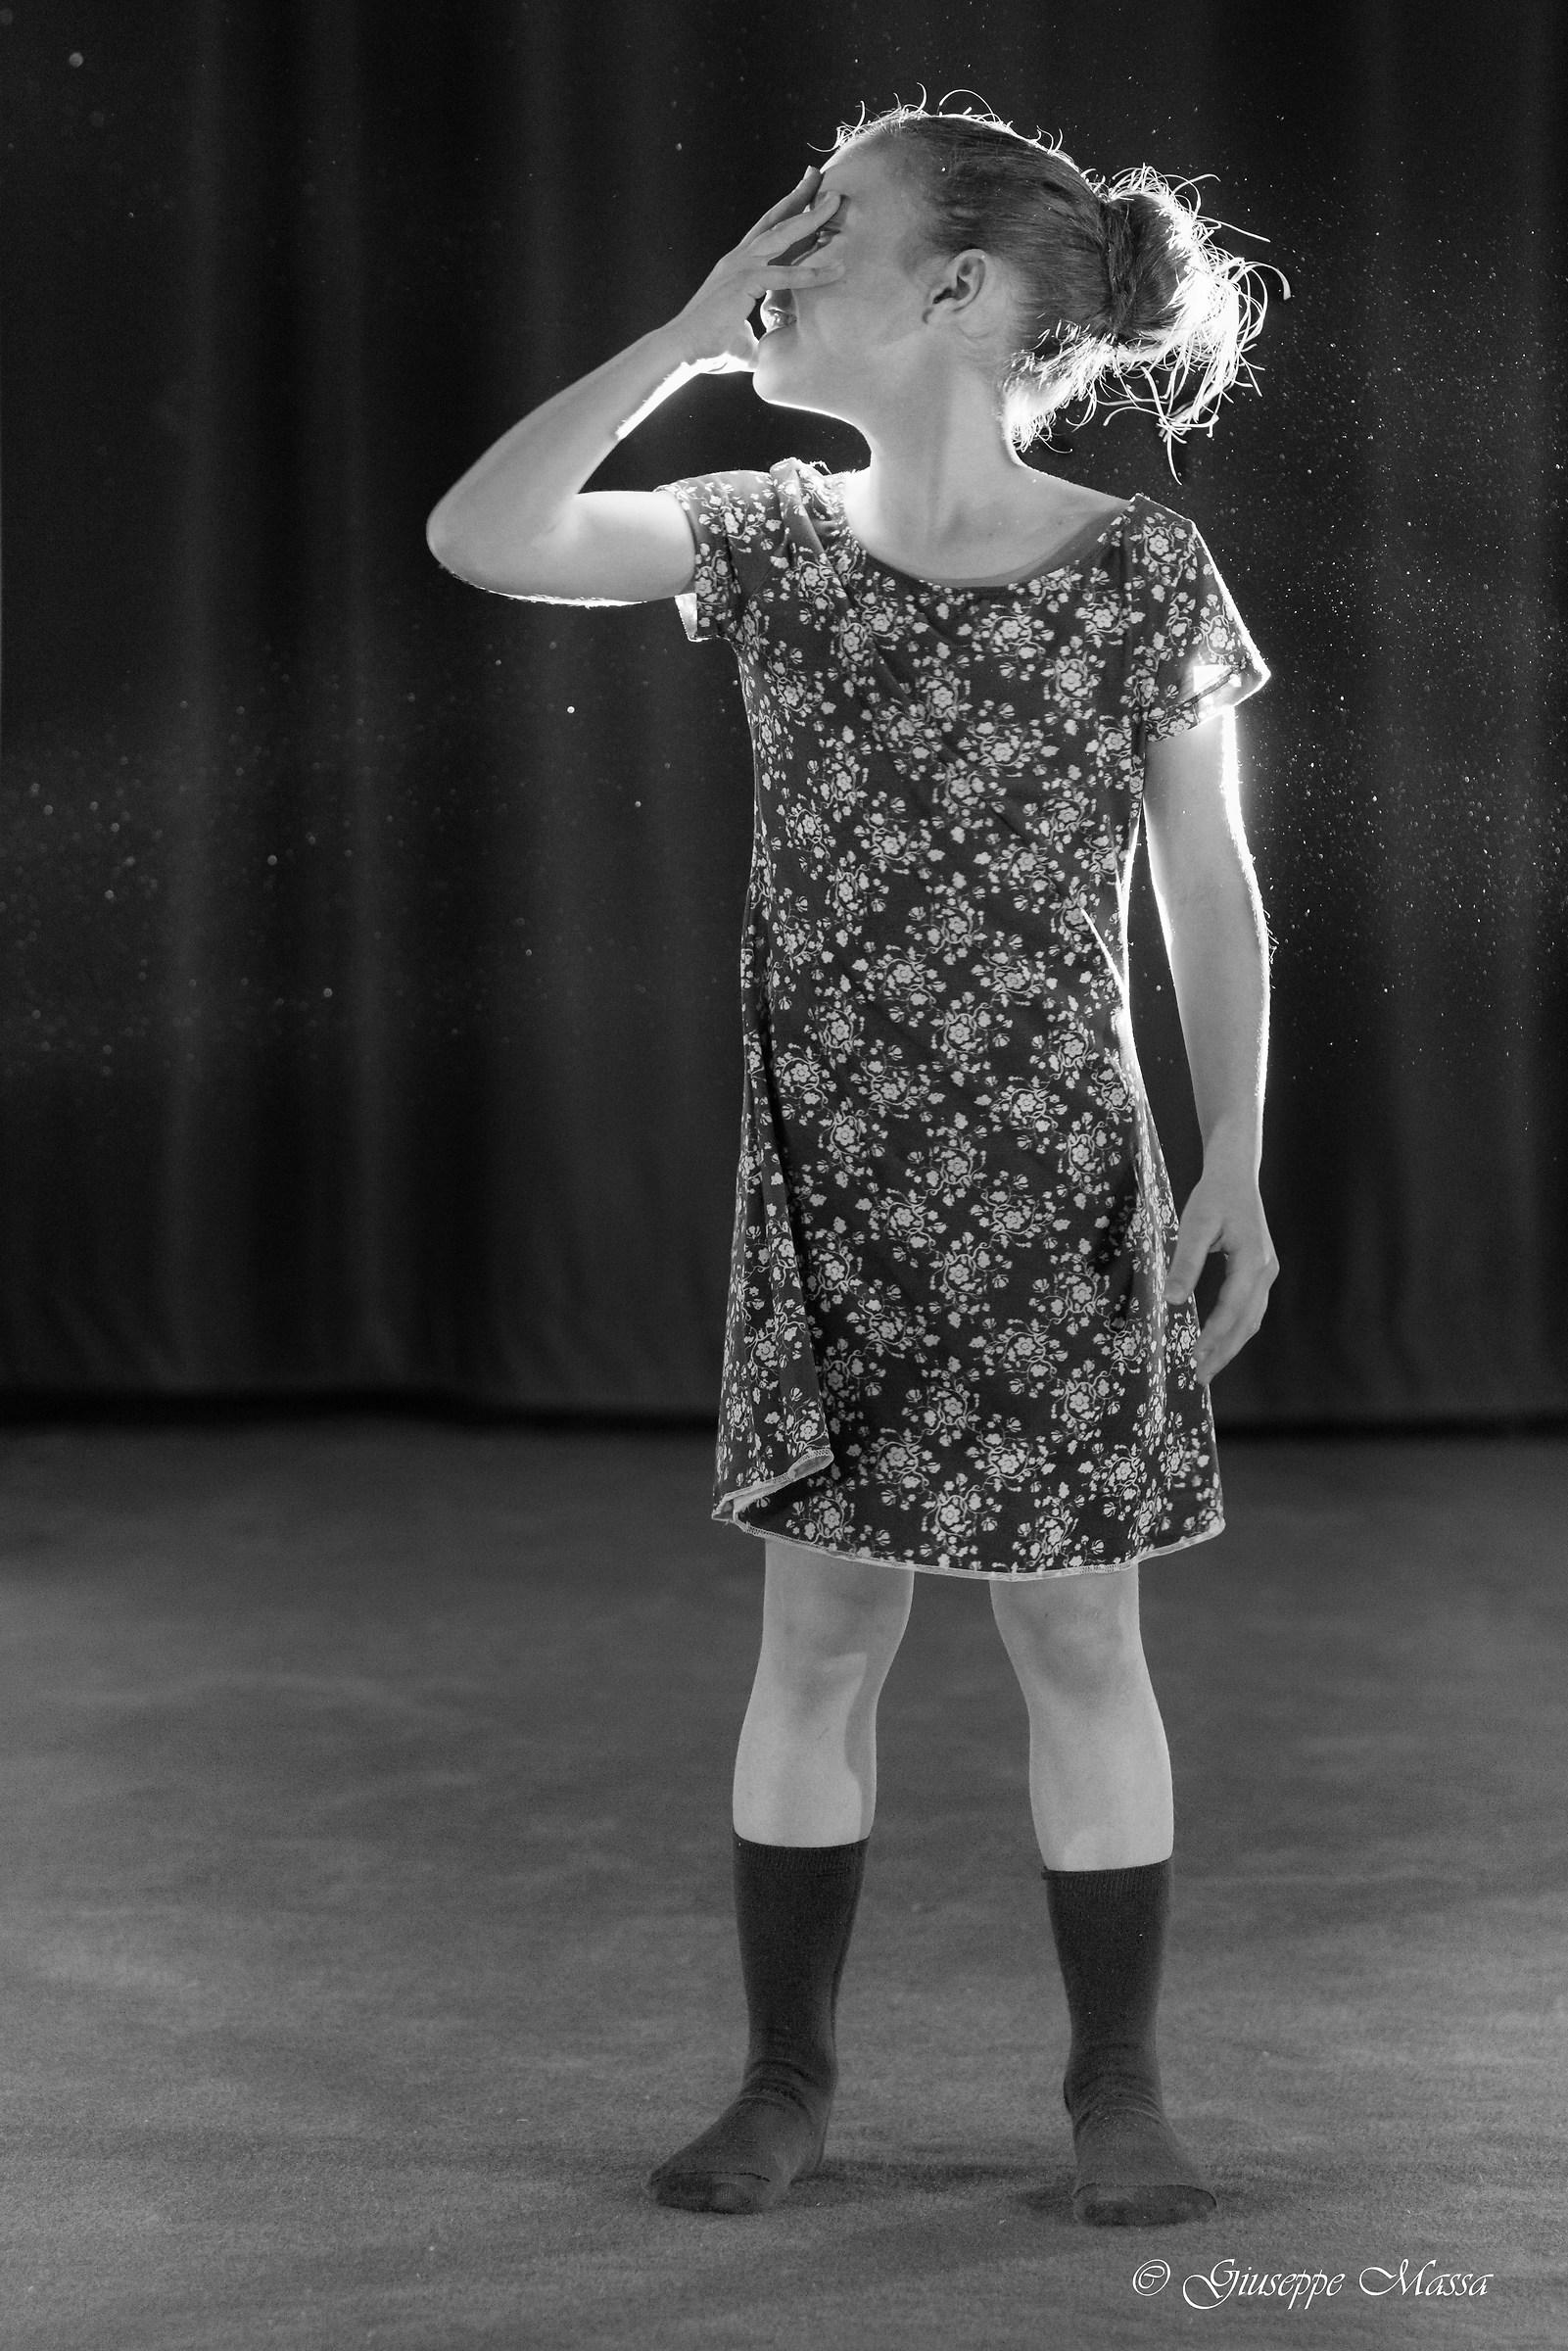 Little dancer 2...